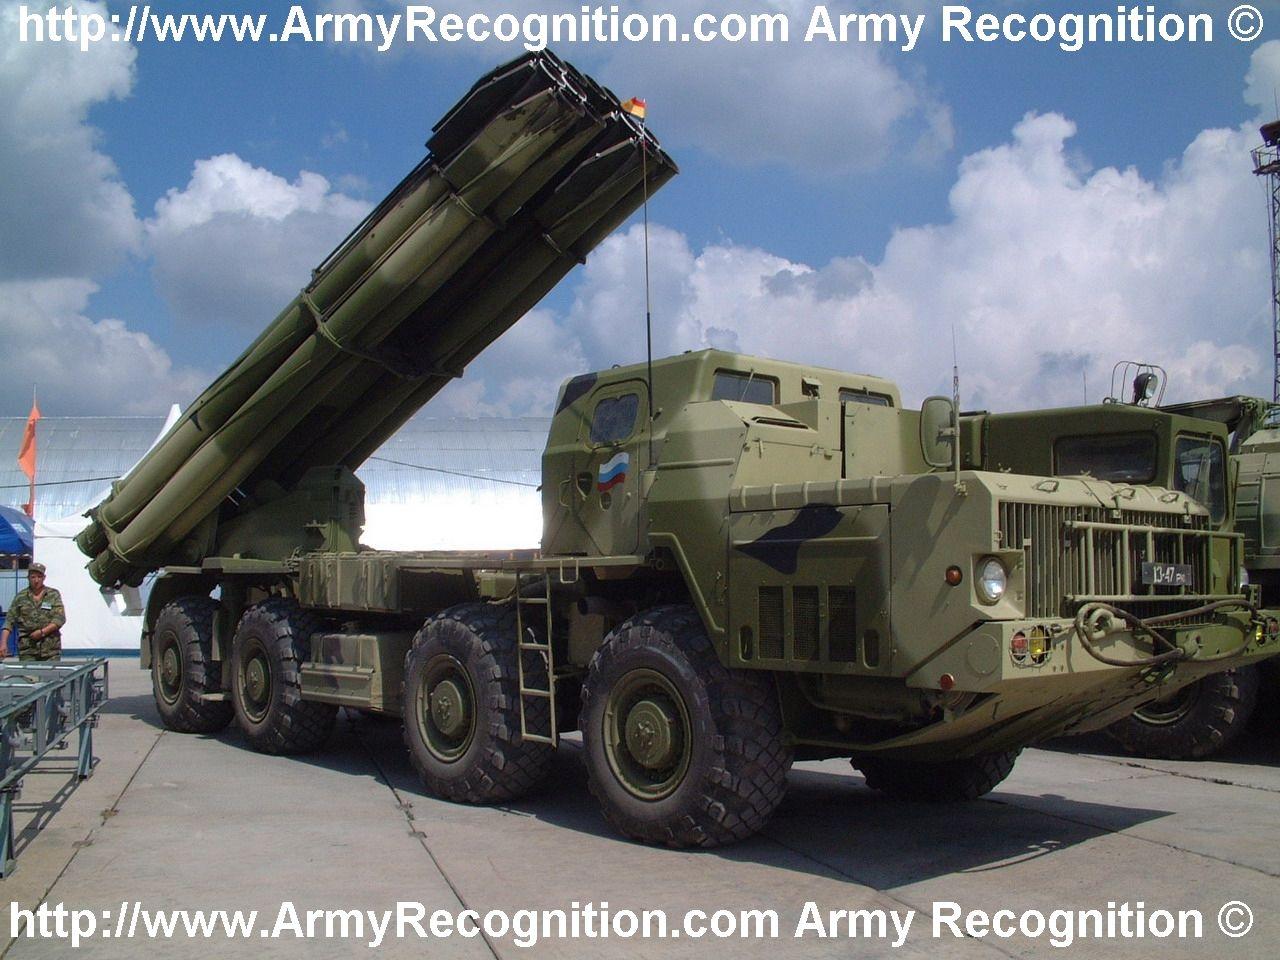 Pantsir-S1  + BM-30 SMERCH la mescla perfecta Smerch_russia_ArmyRecognition_7_001